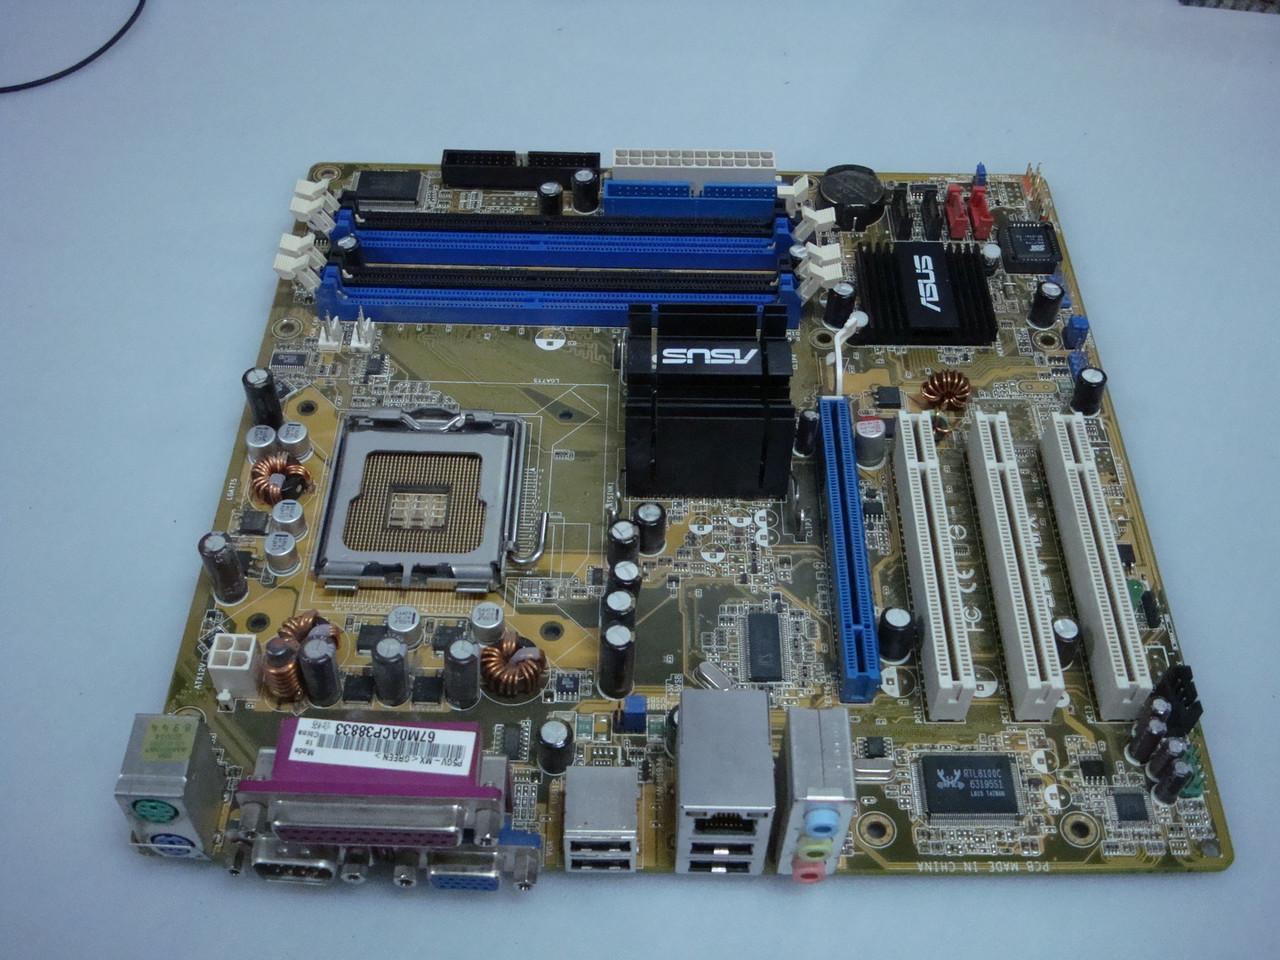 Материнская плата Socket775 Asus P5GV-MX DDR2 память,(I915GV, PCI-E x16)